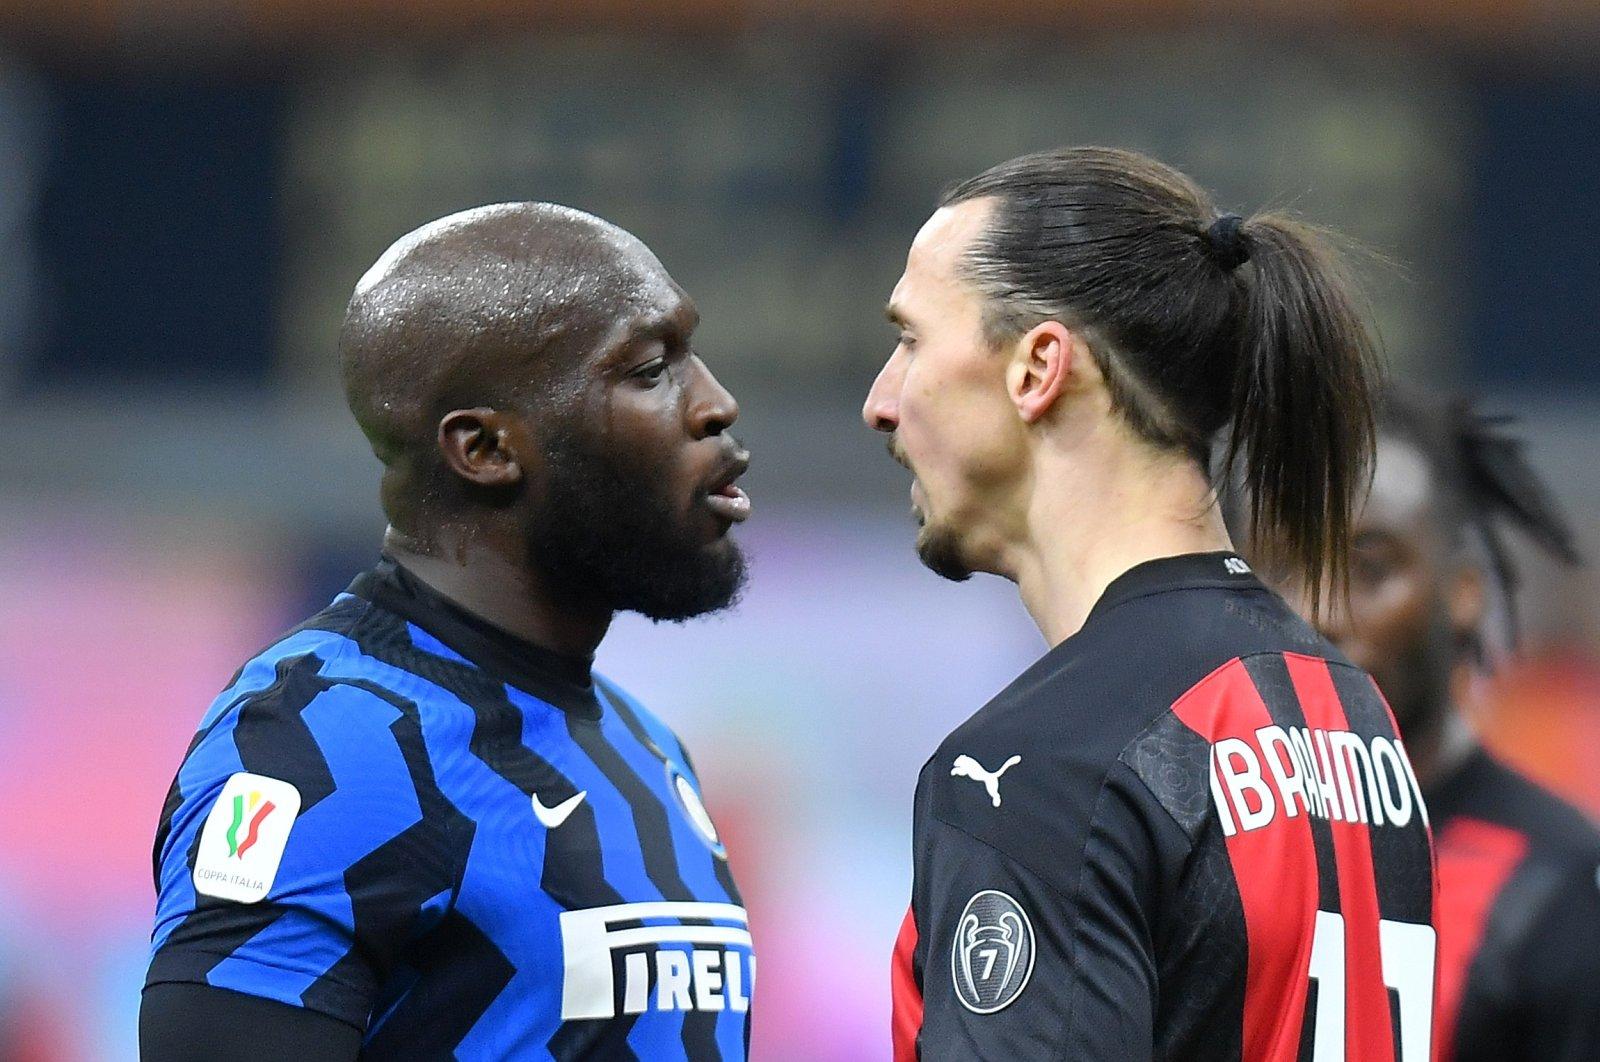 AC Milan's Zlatan Ibrahimovic (R) and Inter Milan's Romelu Lukaku argue during an Italian Cup quarterfinal football match between Inter Milan and AC Milan at the San Siro stadium, in Milan, Italy, Jan. 26, 2021. (Reuters Photo)